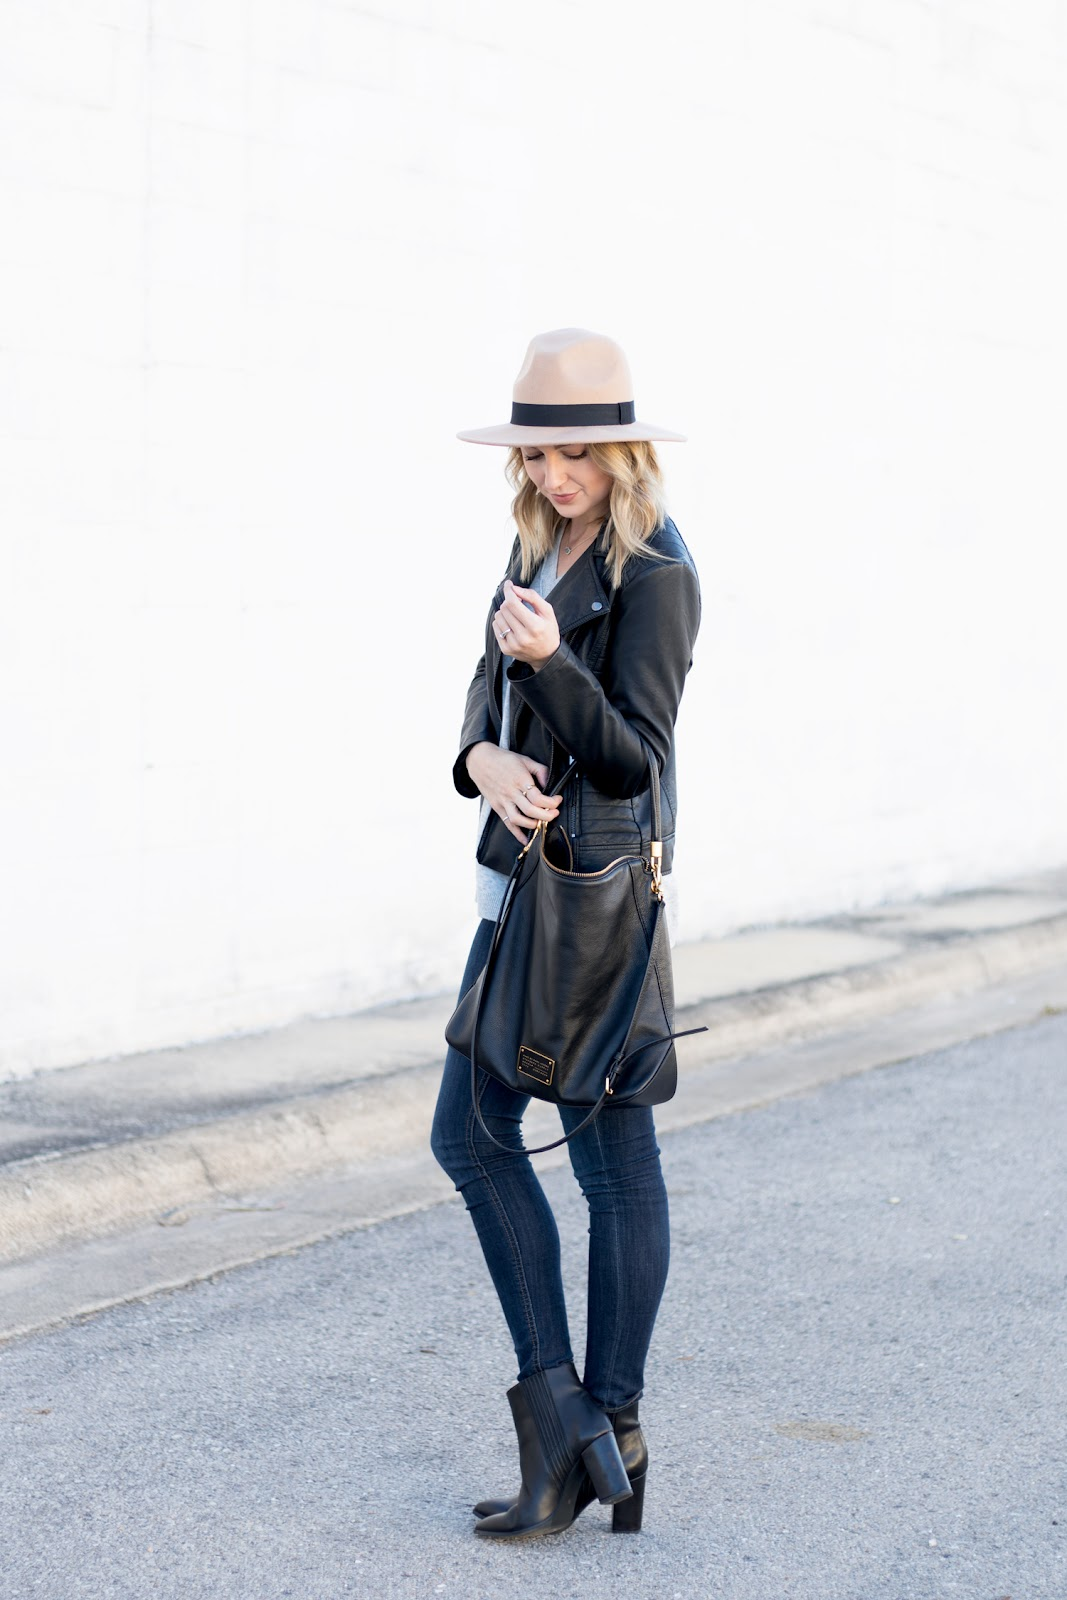 Black leather jacket & booties